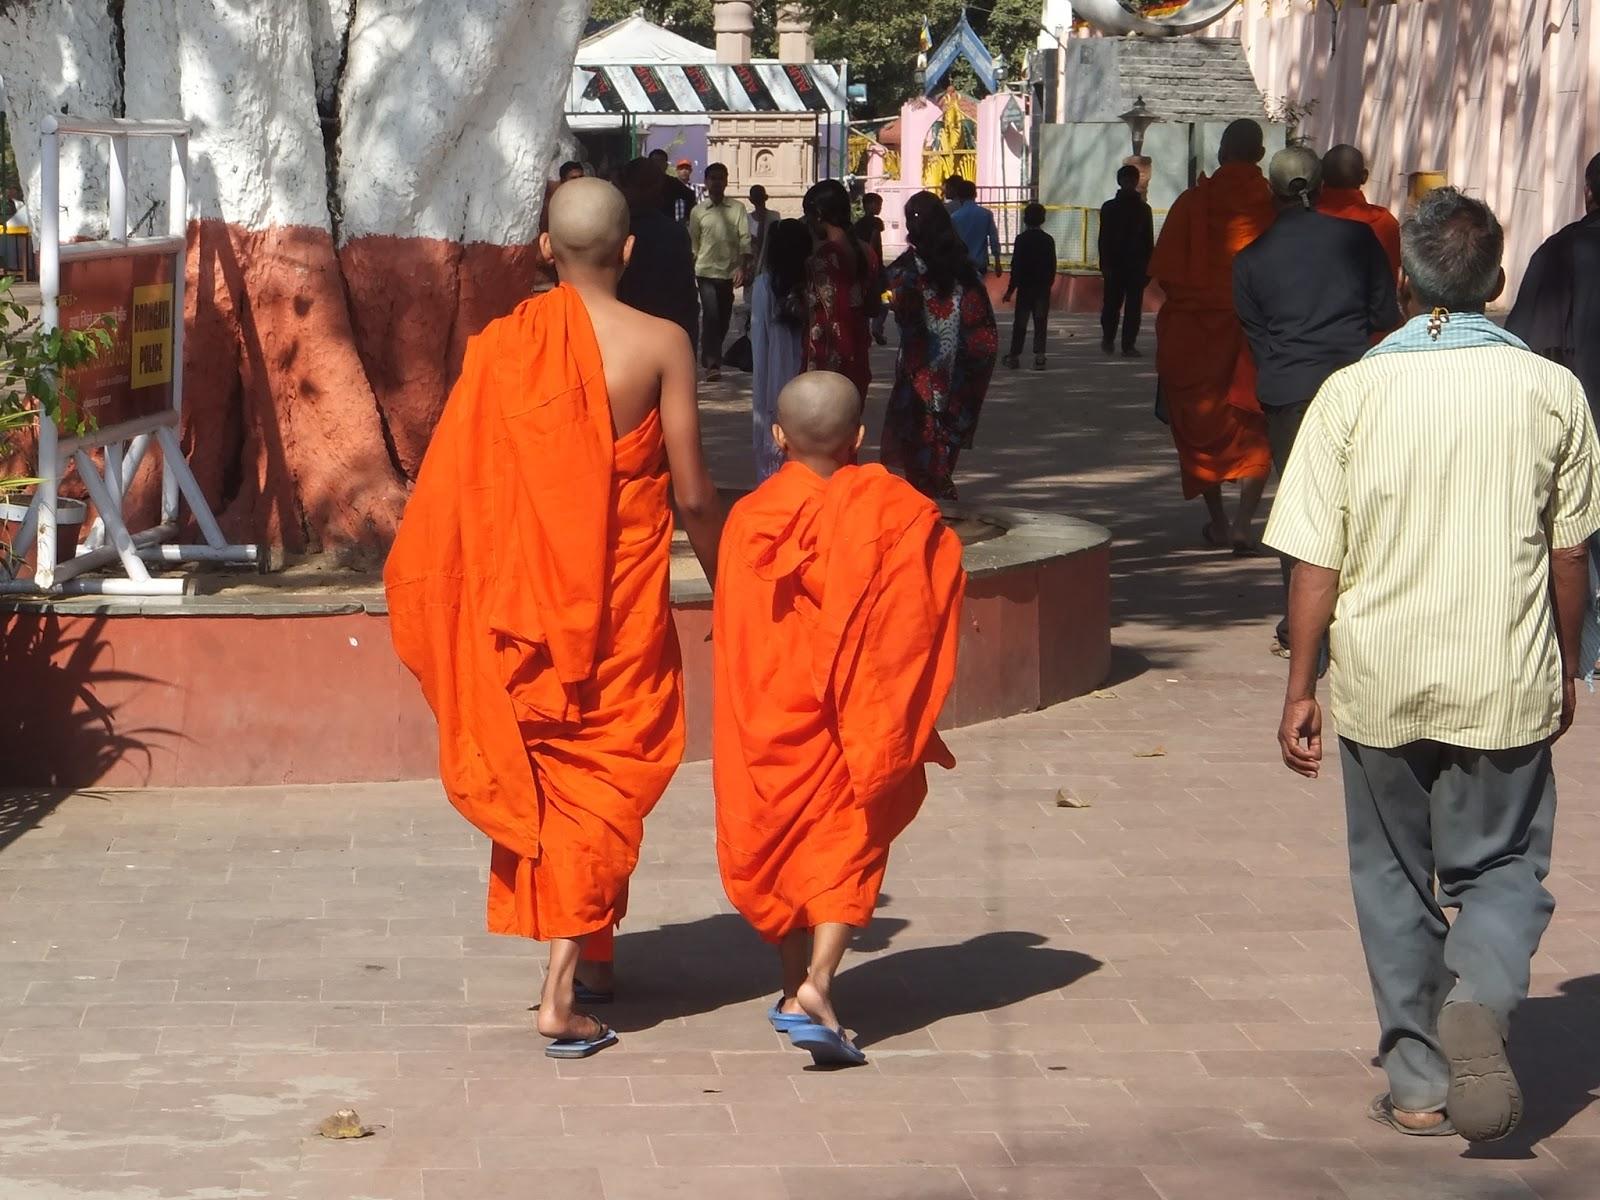 маленький мальчик монах-буддист